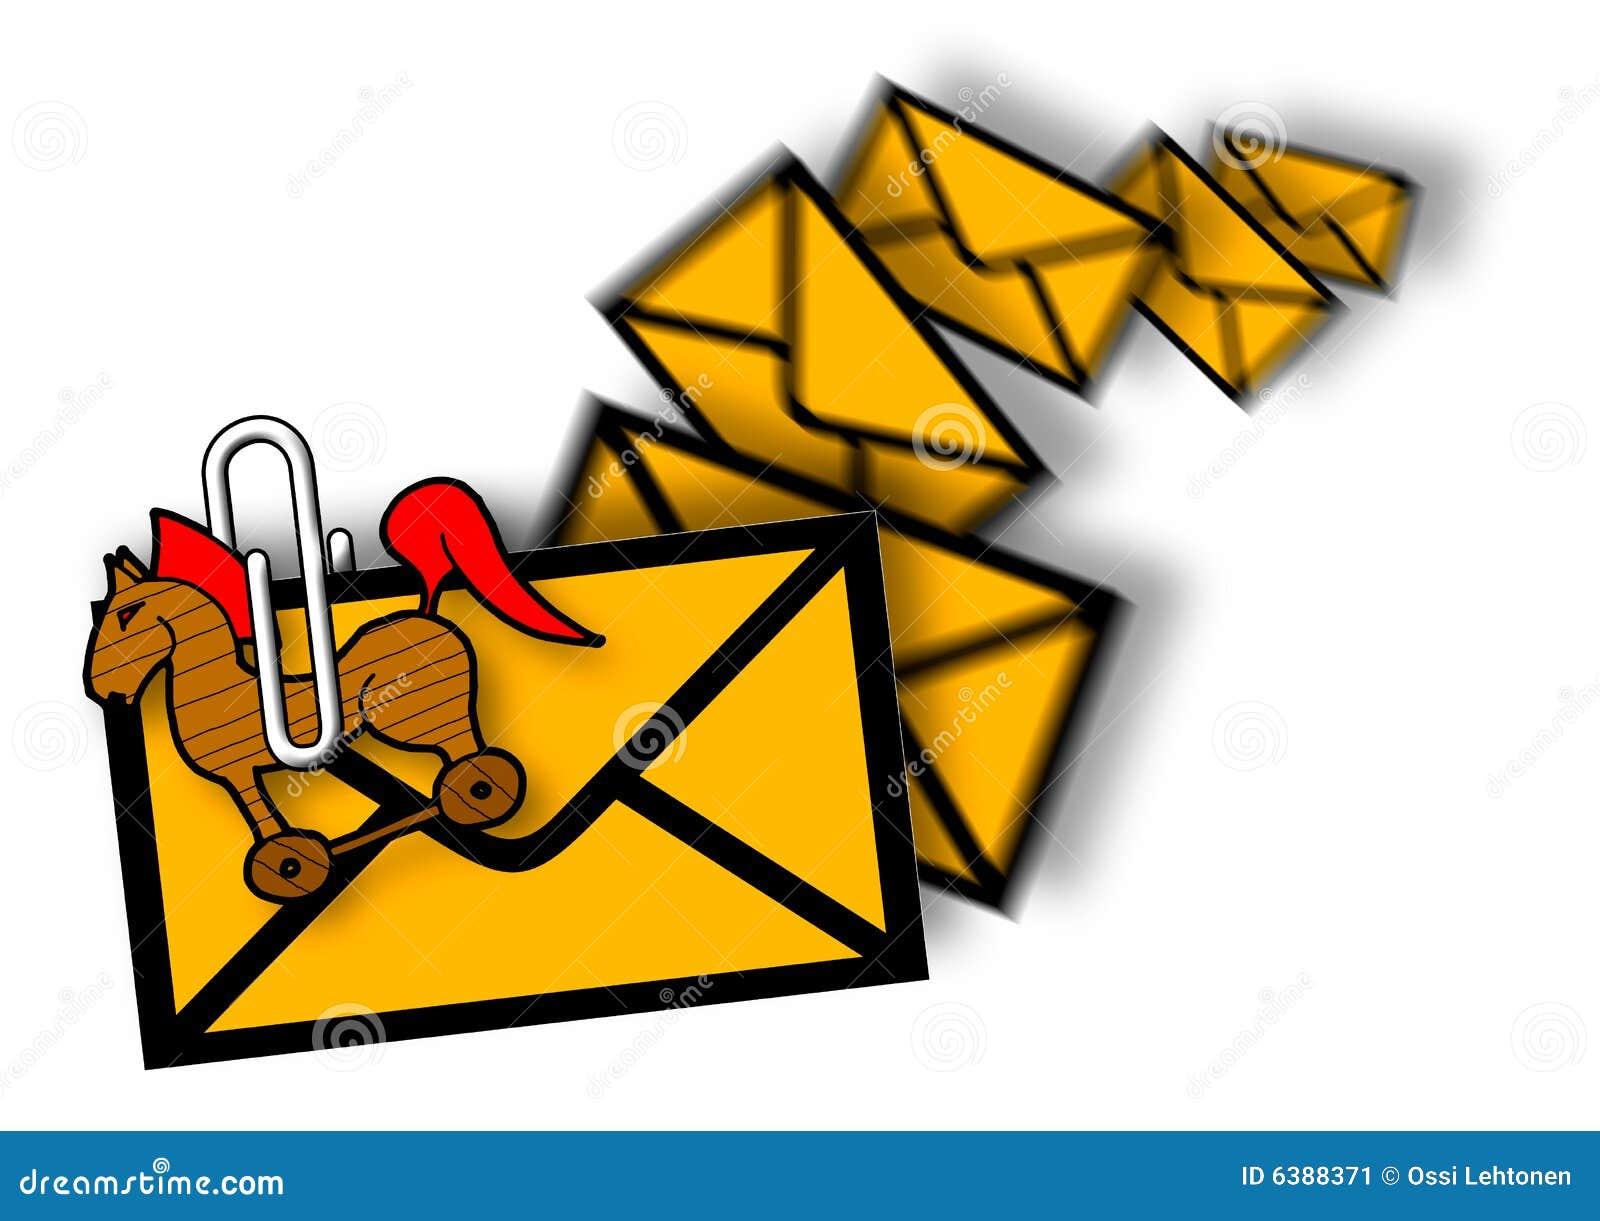 http://zhuanti.hebnews.cn/2015/attachement/png/site2/20150319/b8ca3a788e301674cbc544.png_attachement e troijan的邮寄宣传品.